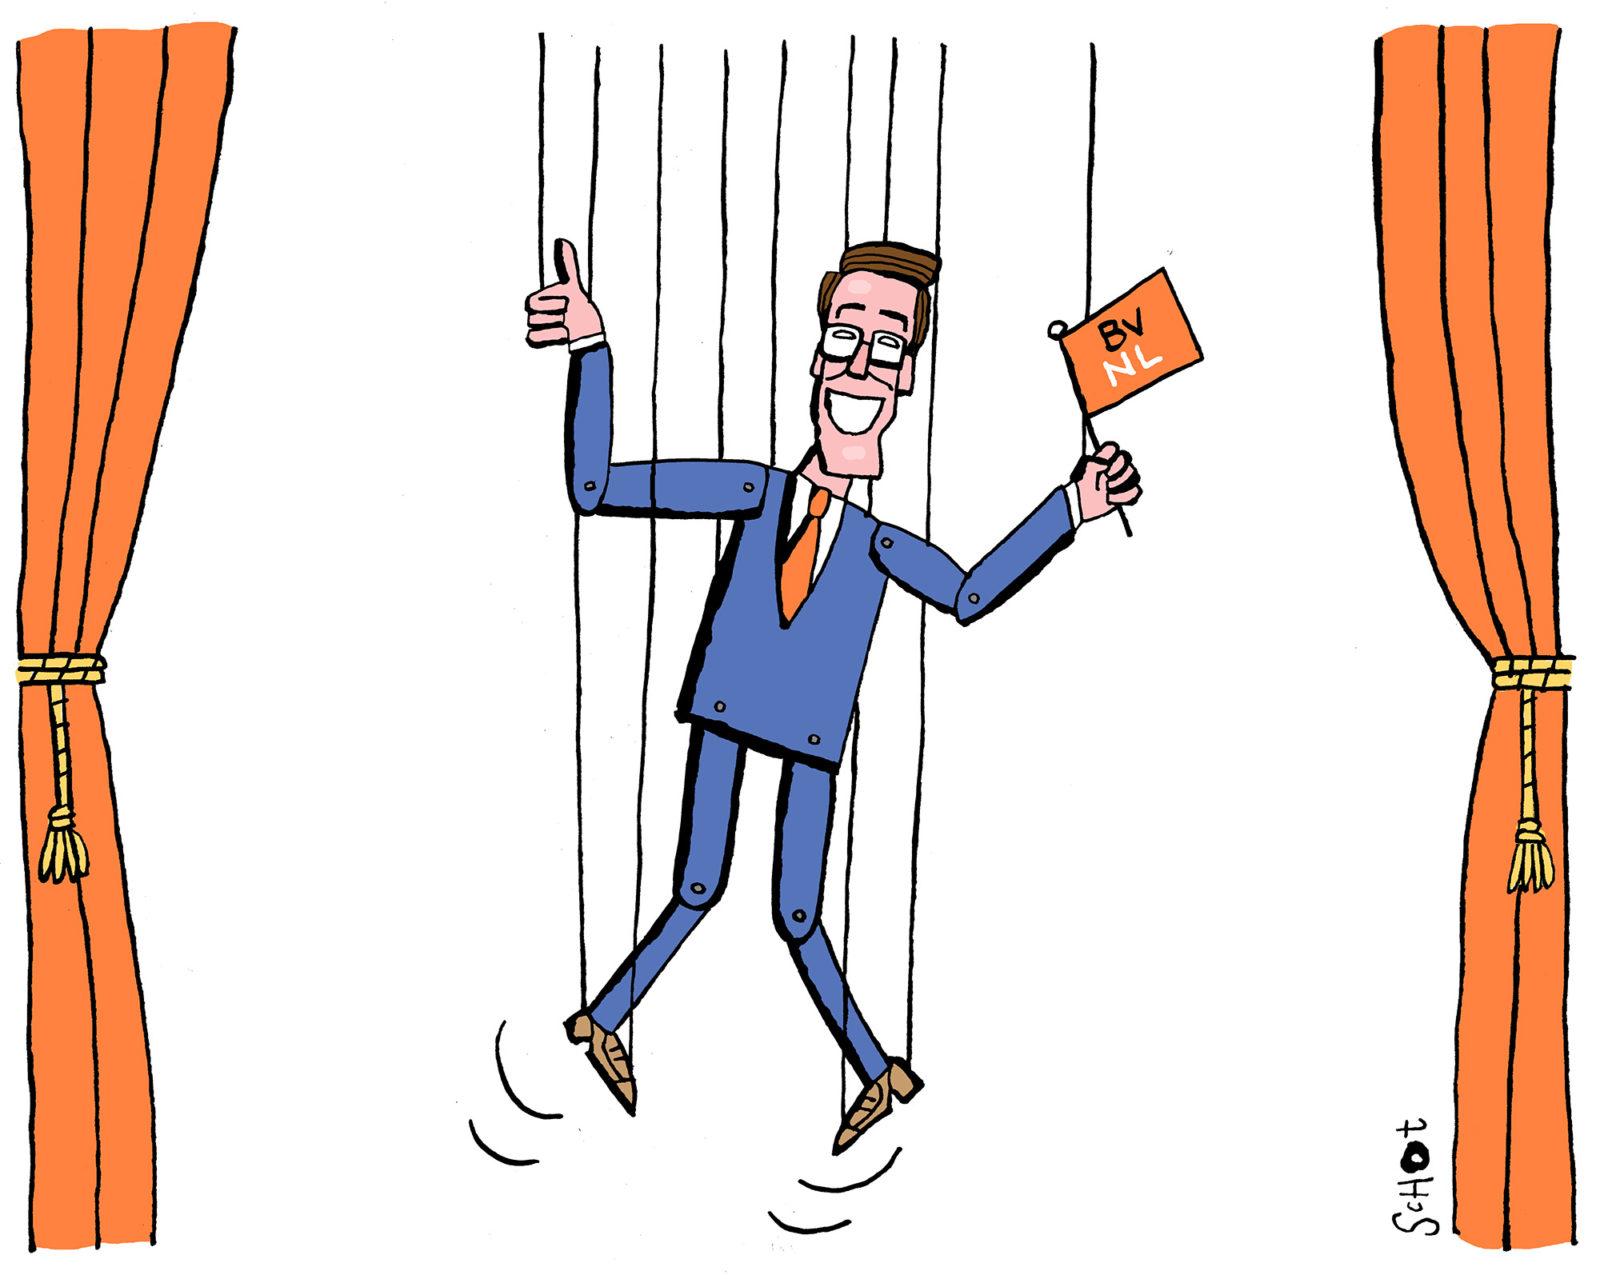 de-kwestie-dividendbelasting-marionet-rutte-bv-nl-bas-van-der-schot